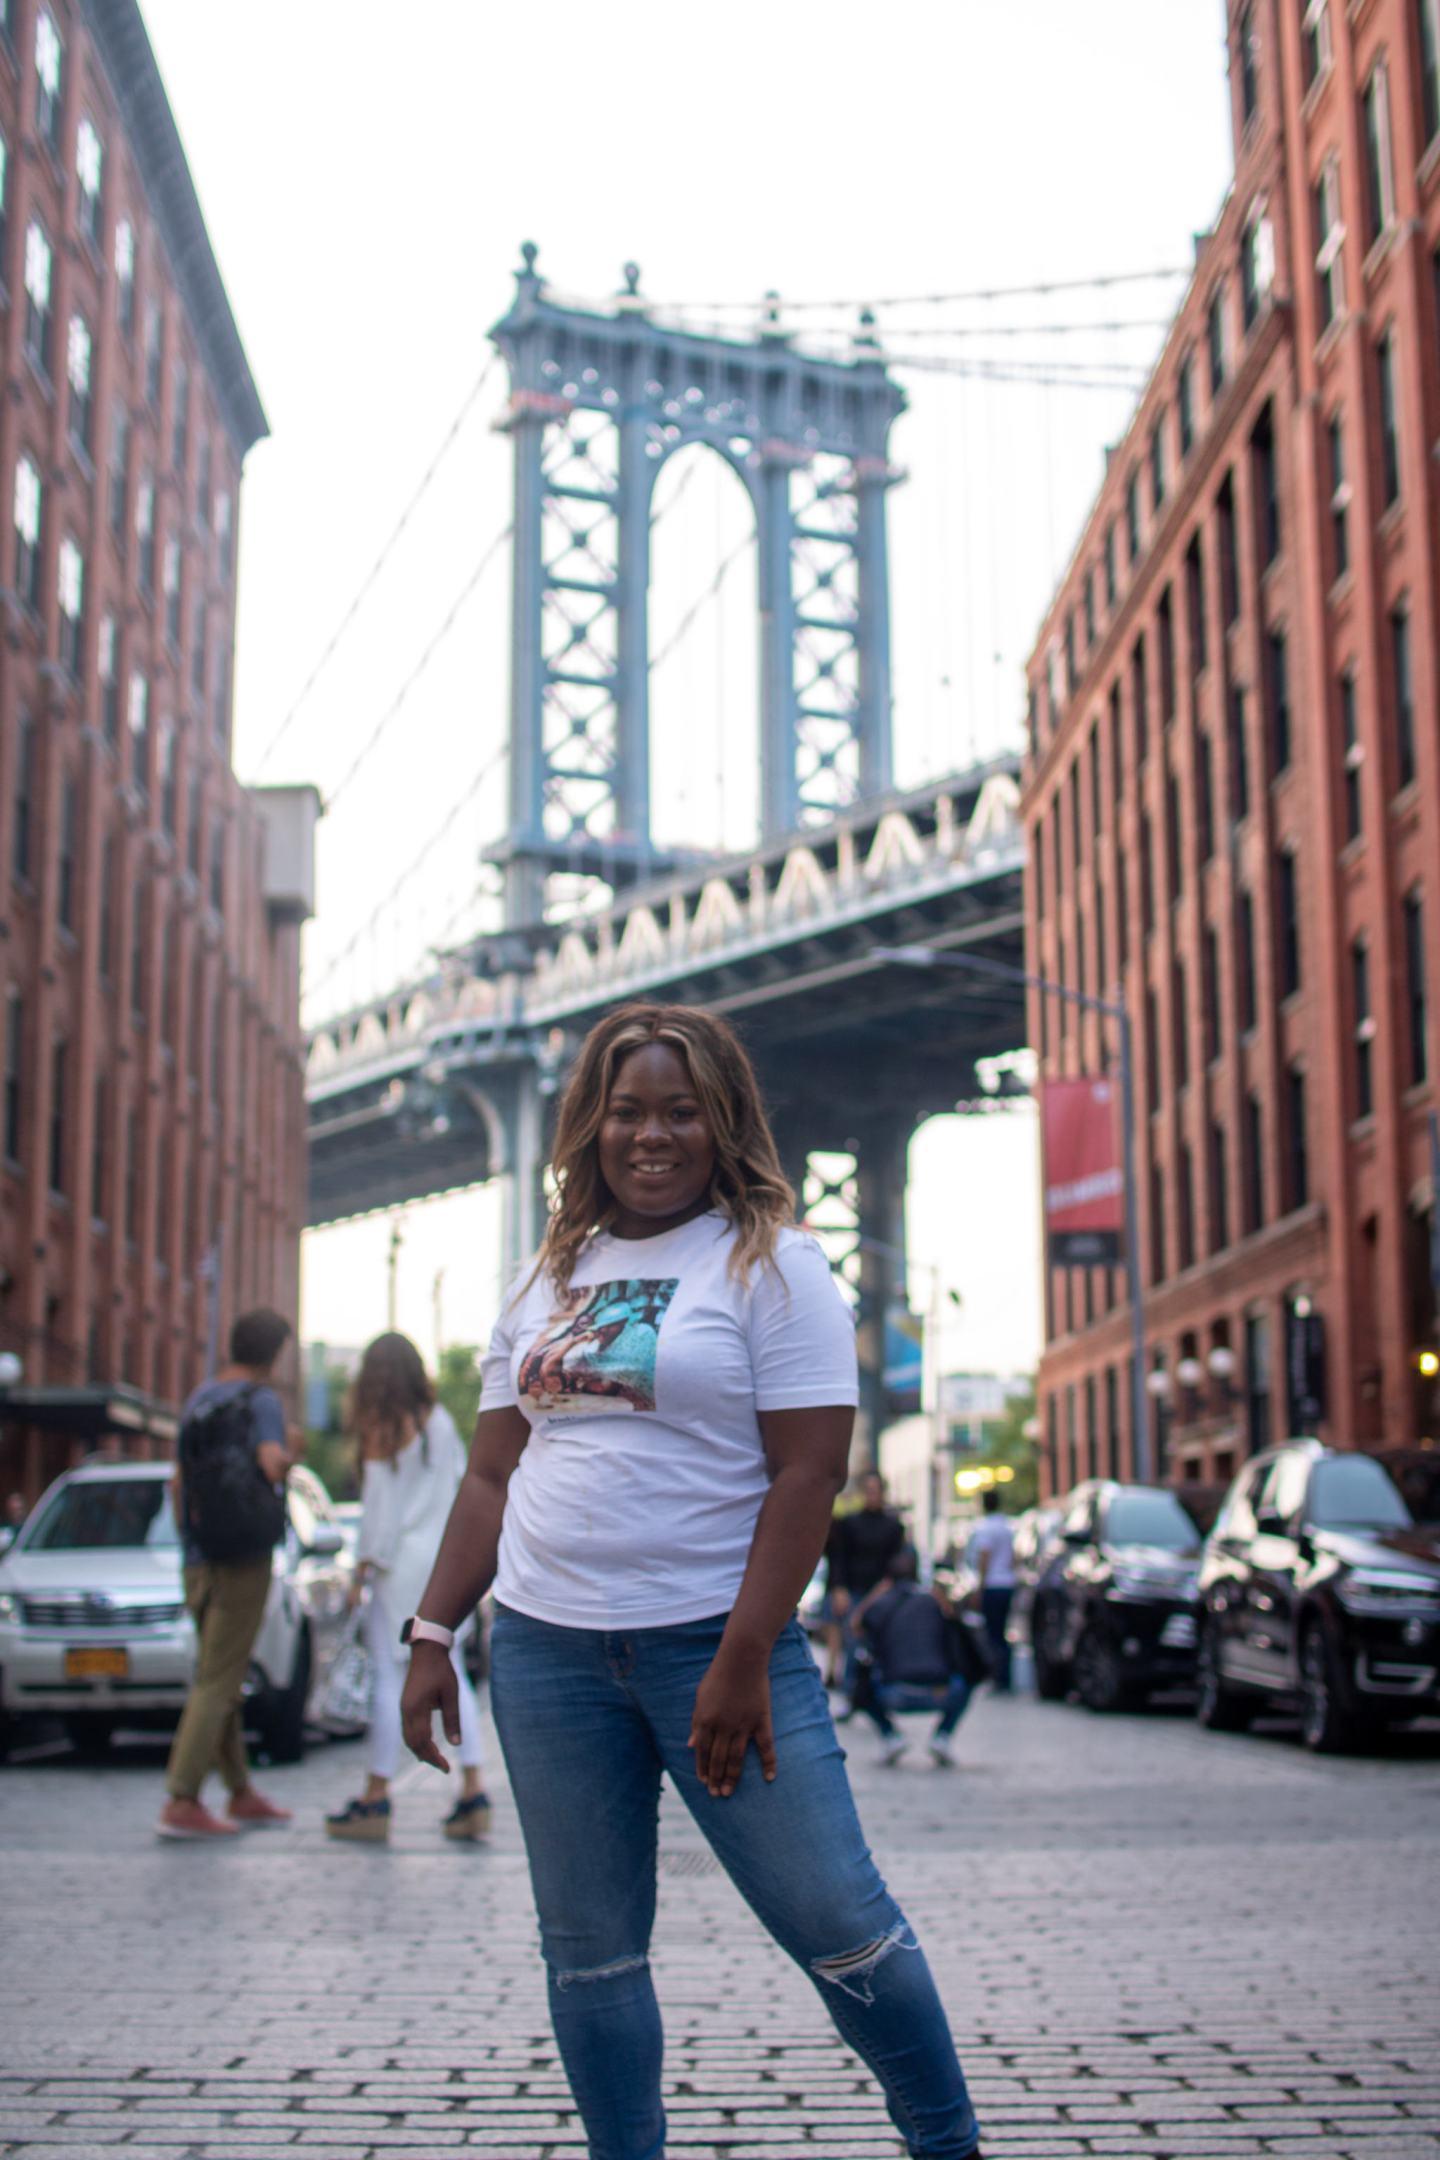 Vera standing in from of the Manhattan Bridge in New York